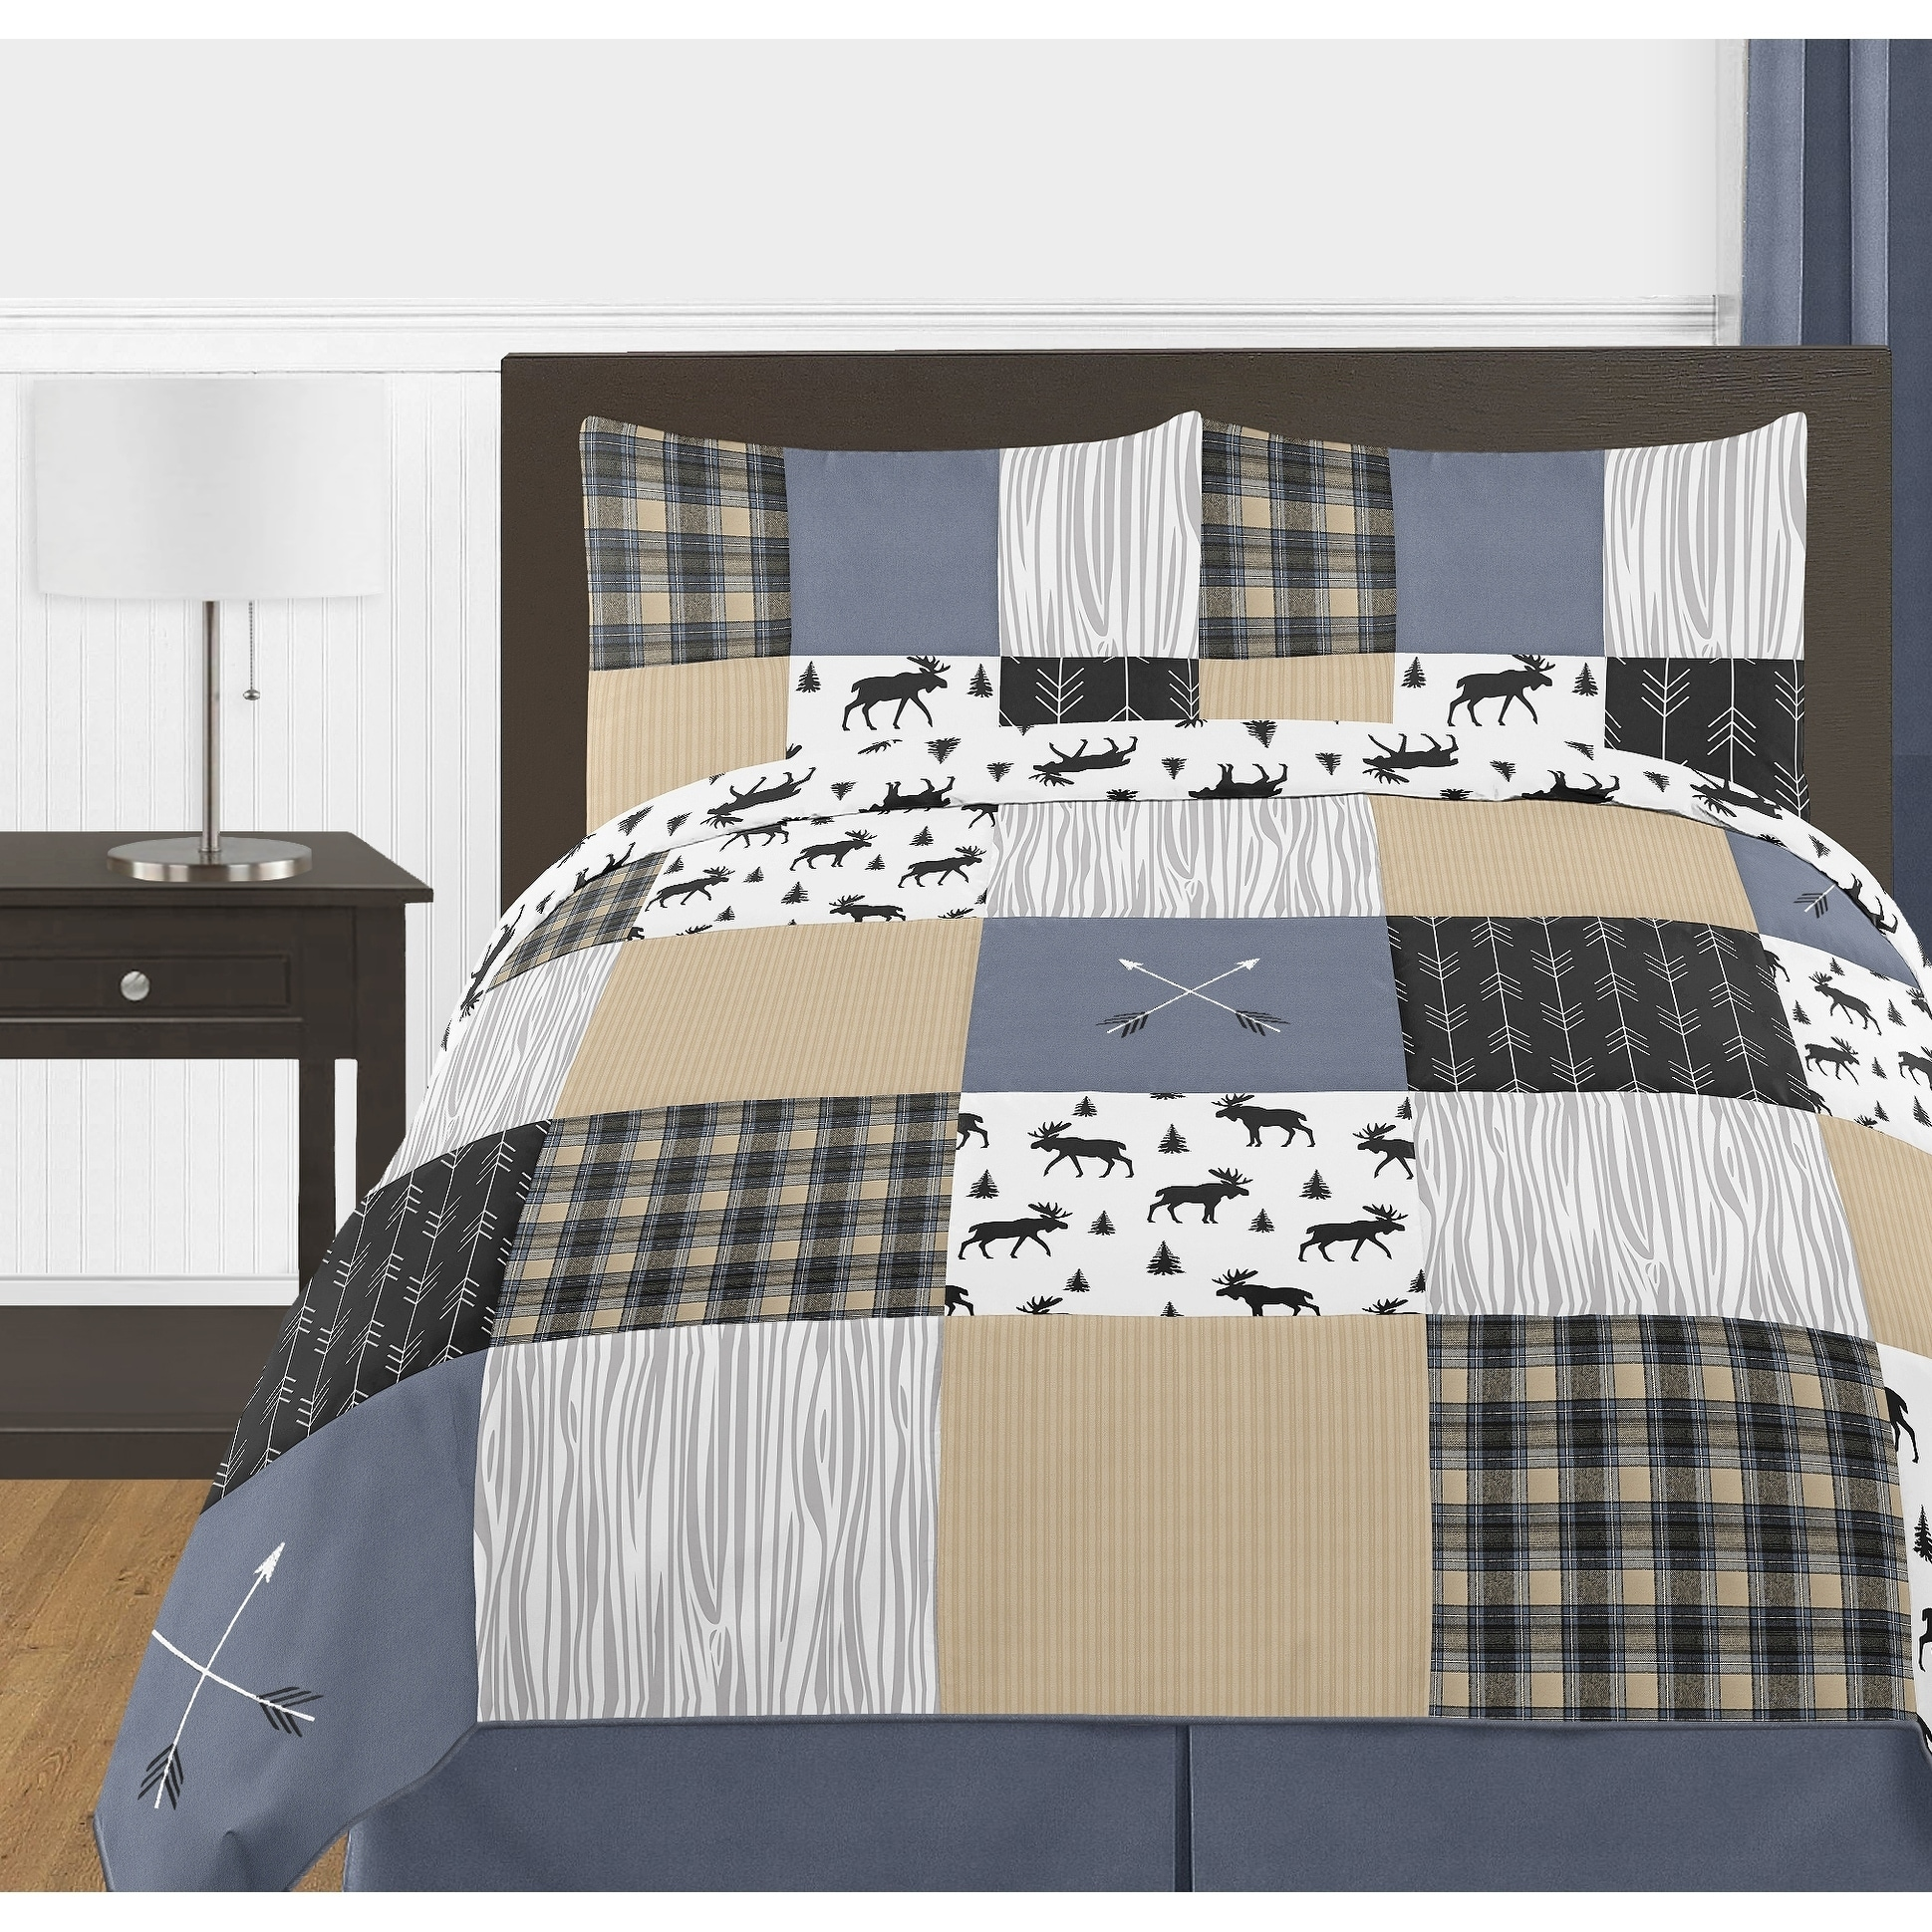 Sweet Jojo Designs Blue Tan Grey Black Woodland Plaid Arrow Rustic Patch Collection Boy 3 Piece Full Queen Size Comforter Set Overstock 27279094